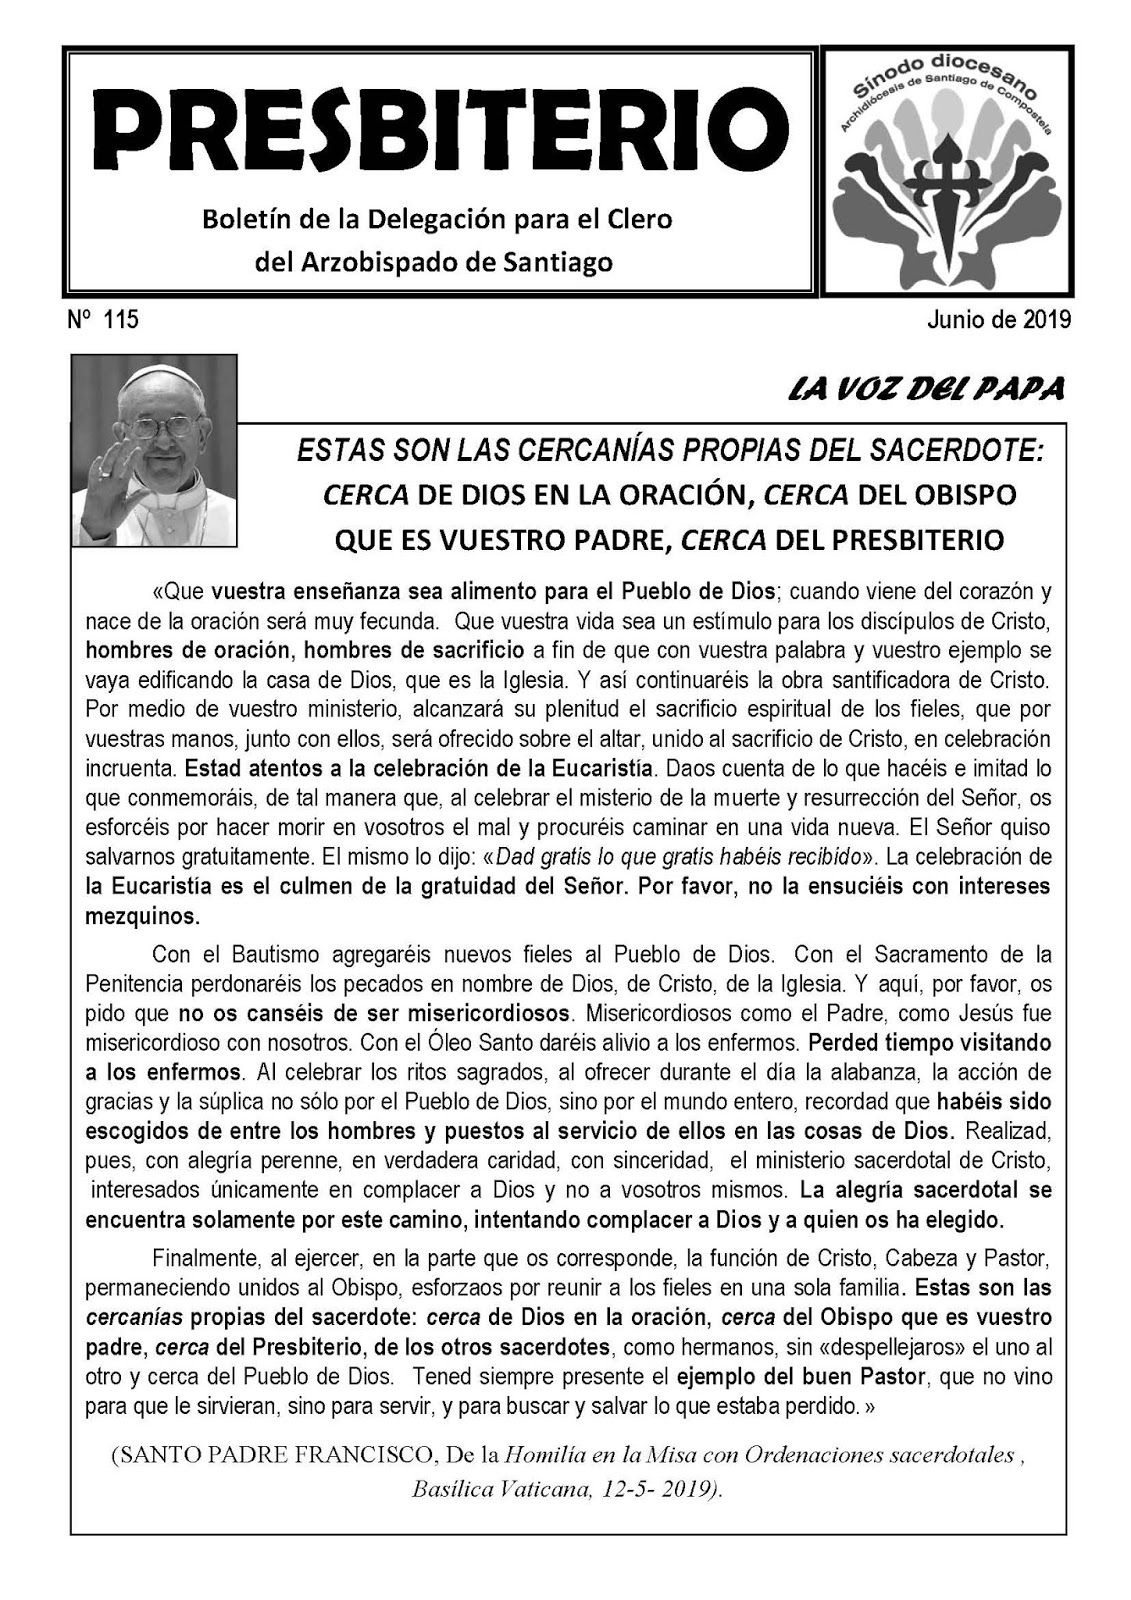 https://www.dropbox.com/s/8bhyd0ik2g5i62x/Presbiterio_115.pdf?dl=0